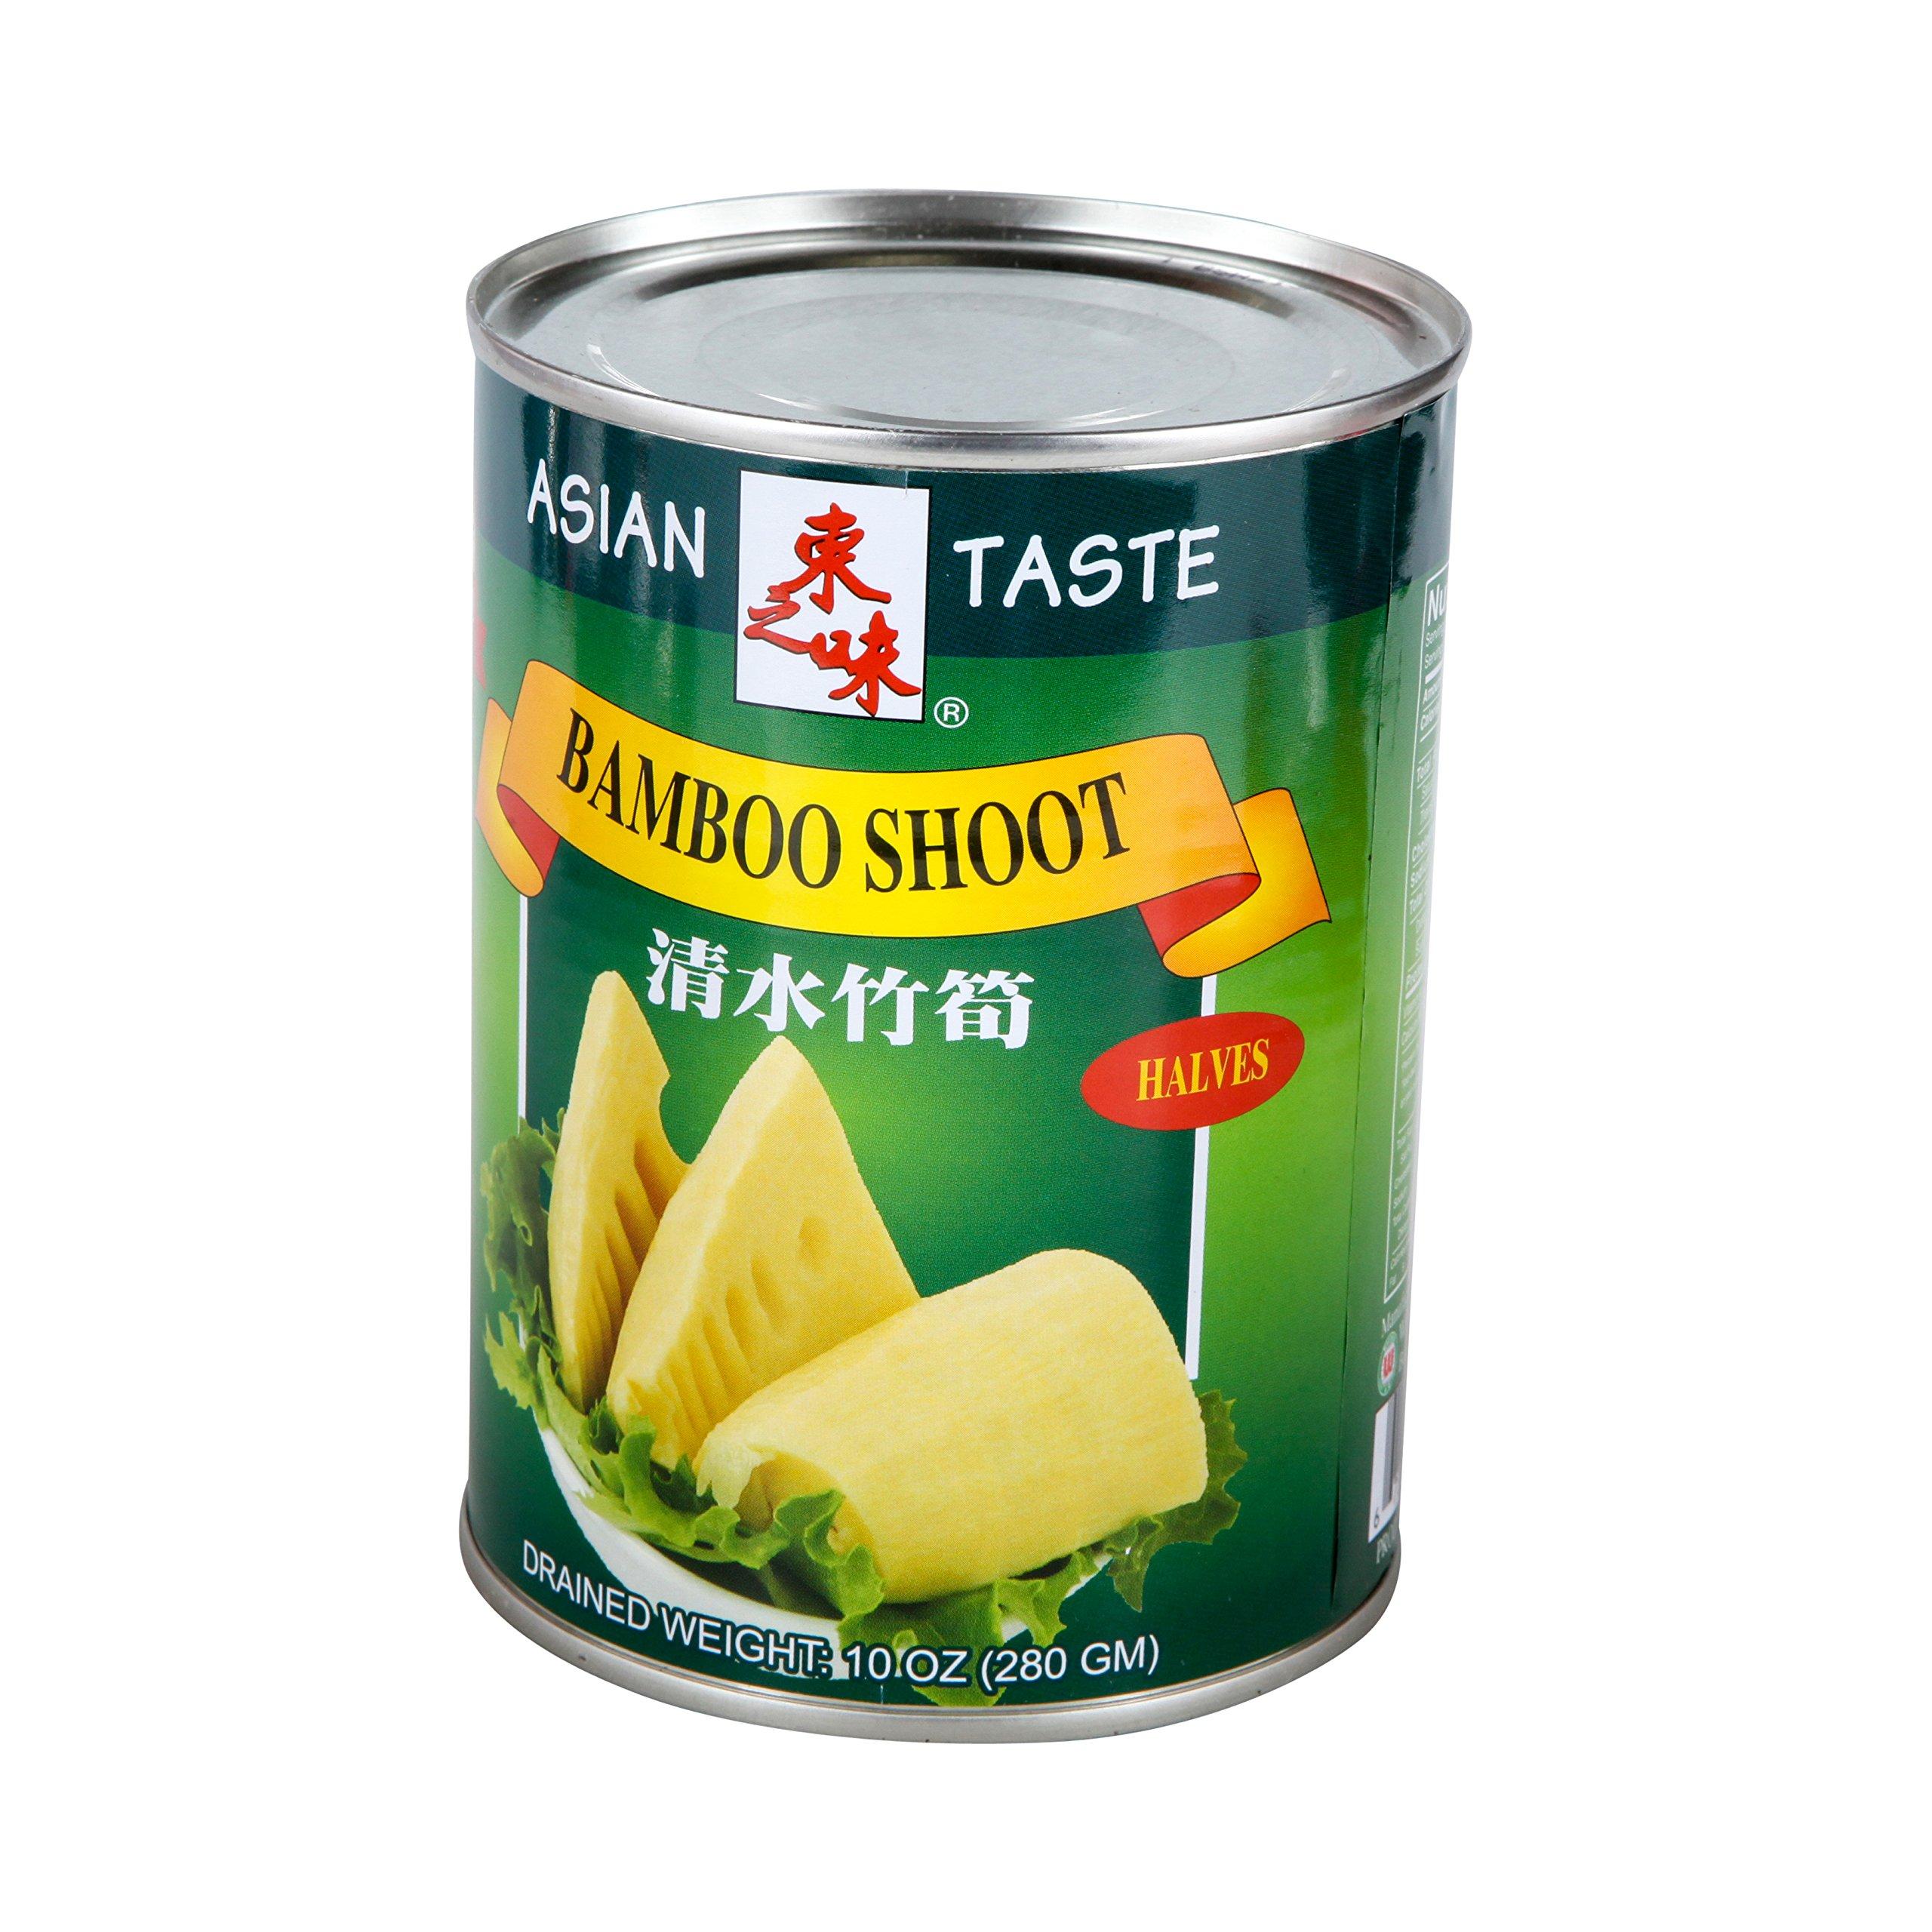 Asian Taste, Bamboo Shoot Halves, 10 oz